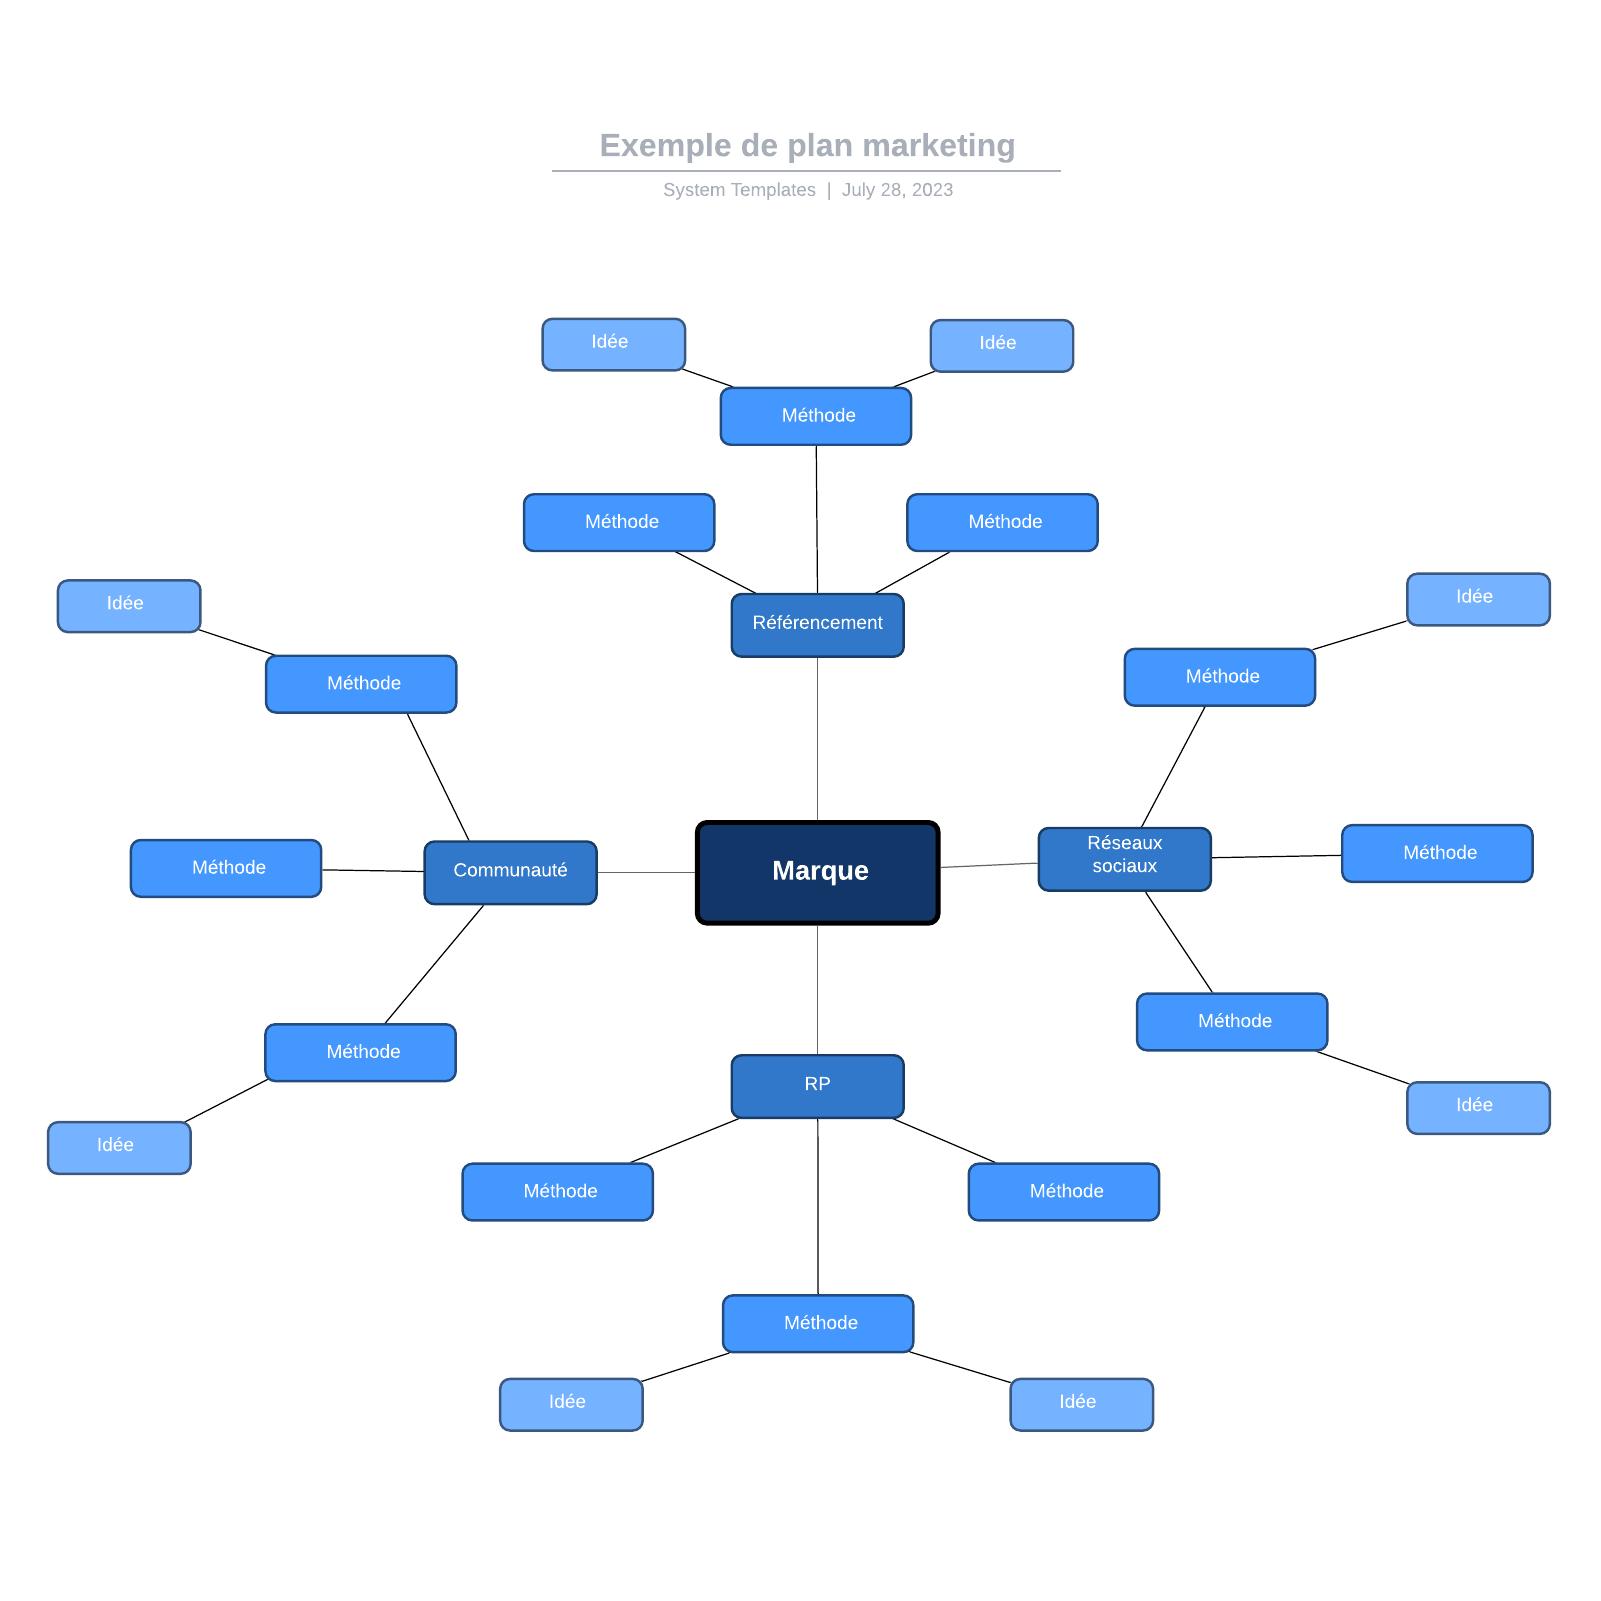 exemple de carte mentale de plan marketing